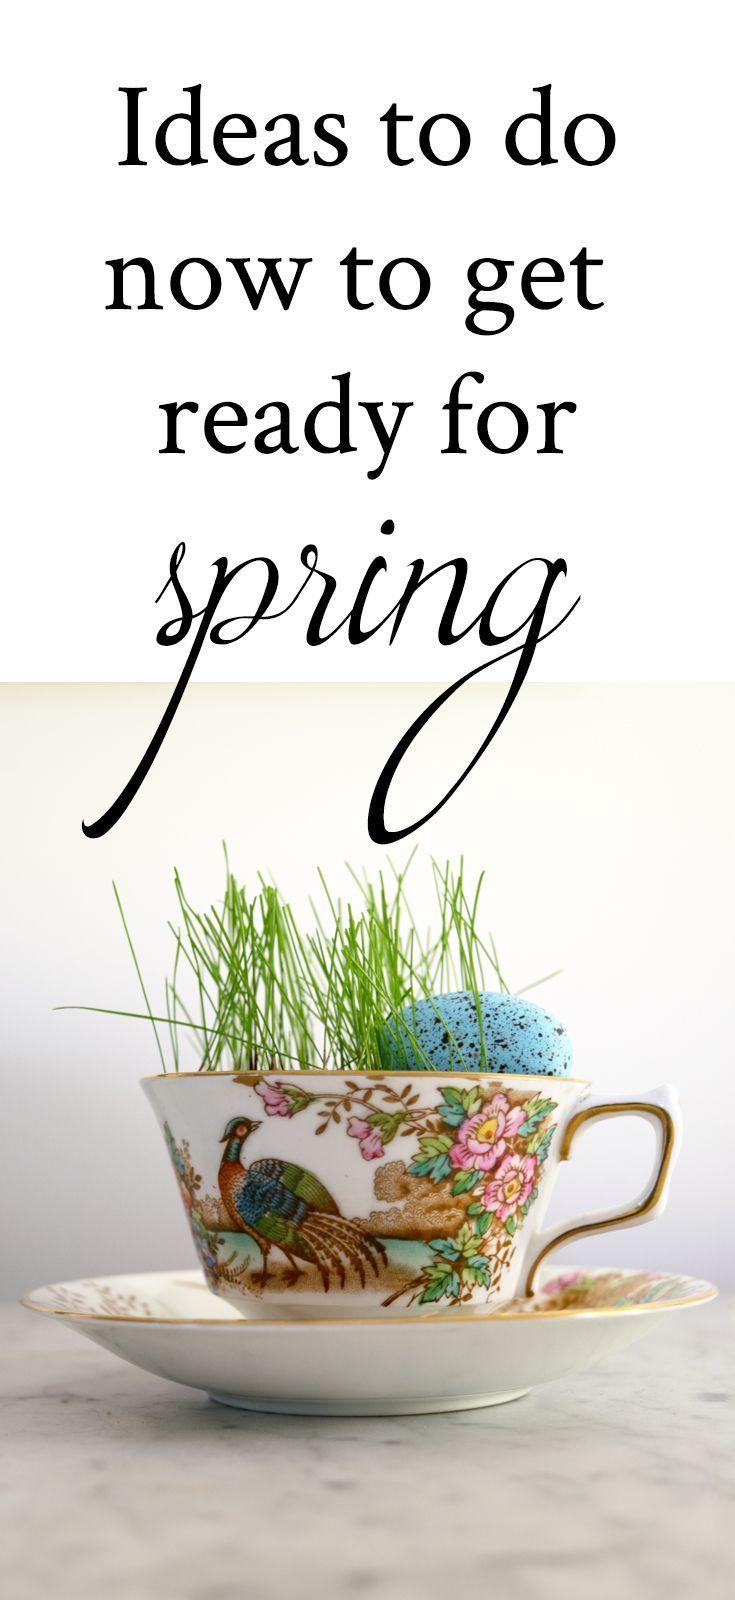 DIY Spring Decor Ideas for Your Home